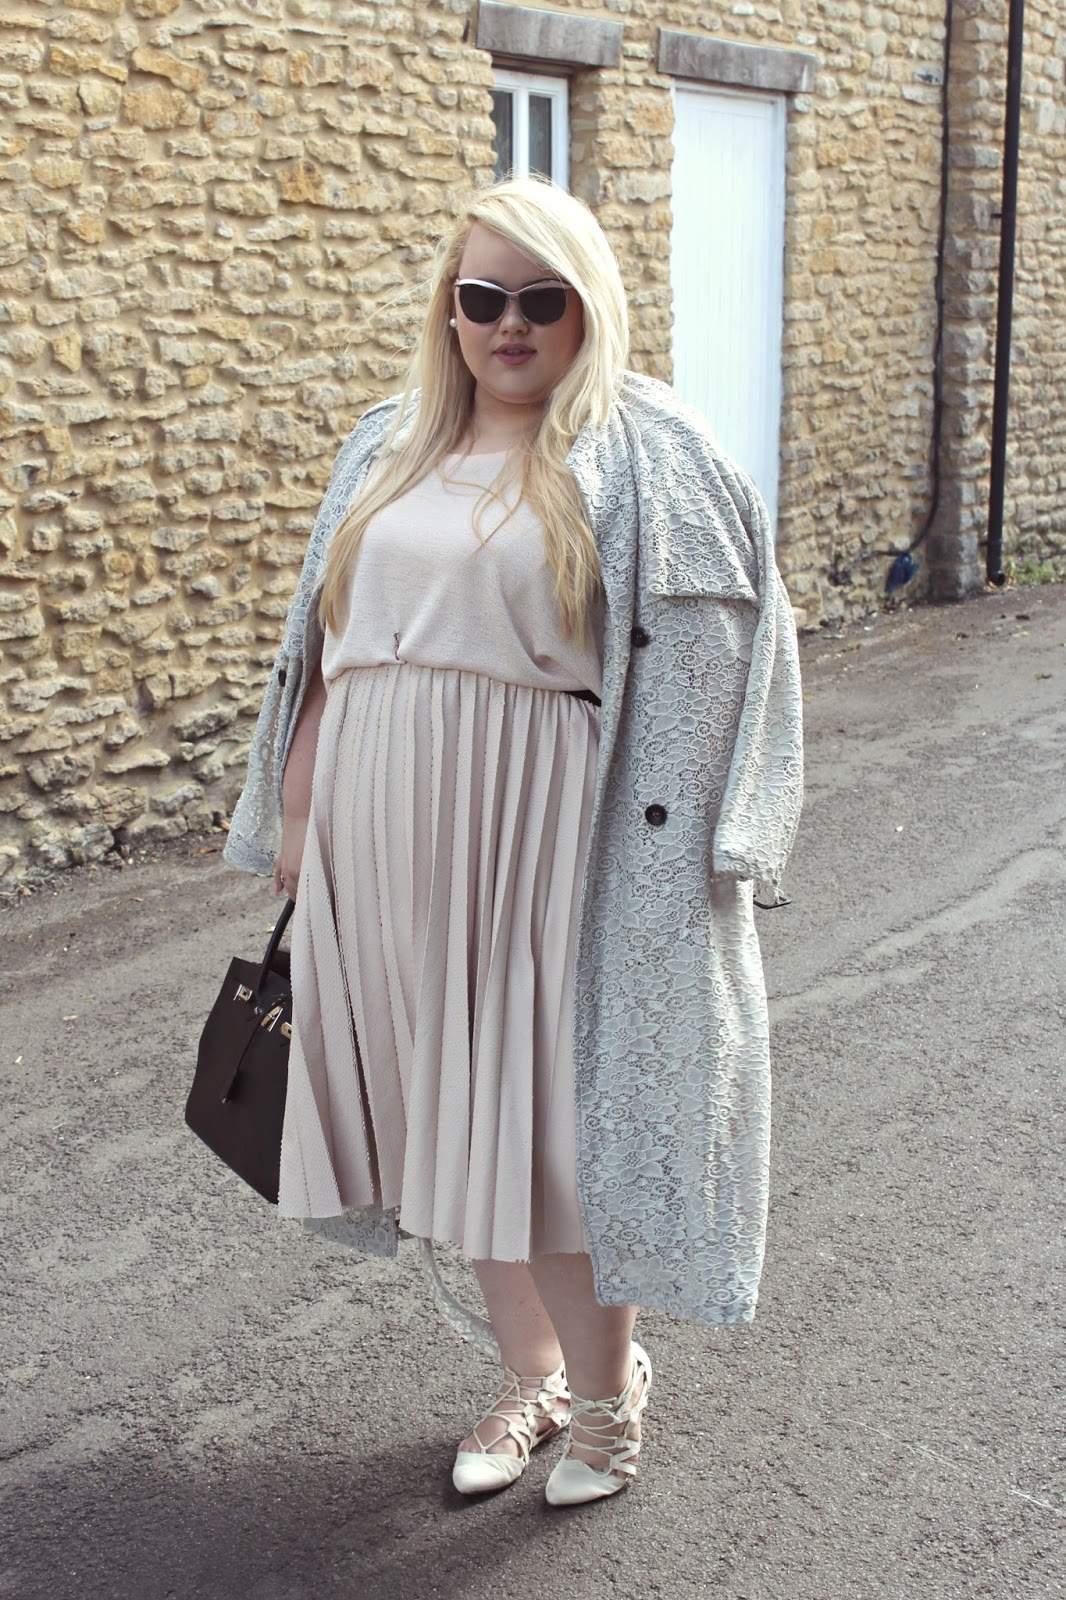 ChloeInCurve www.chloeincurve.com uk plus size blonde blogger elvi navabi skirt midi lae trench coat edit 1